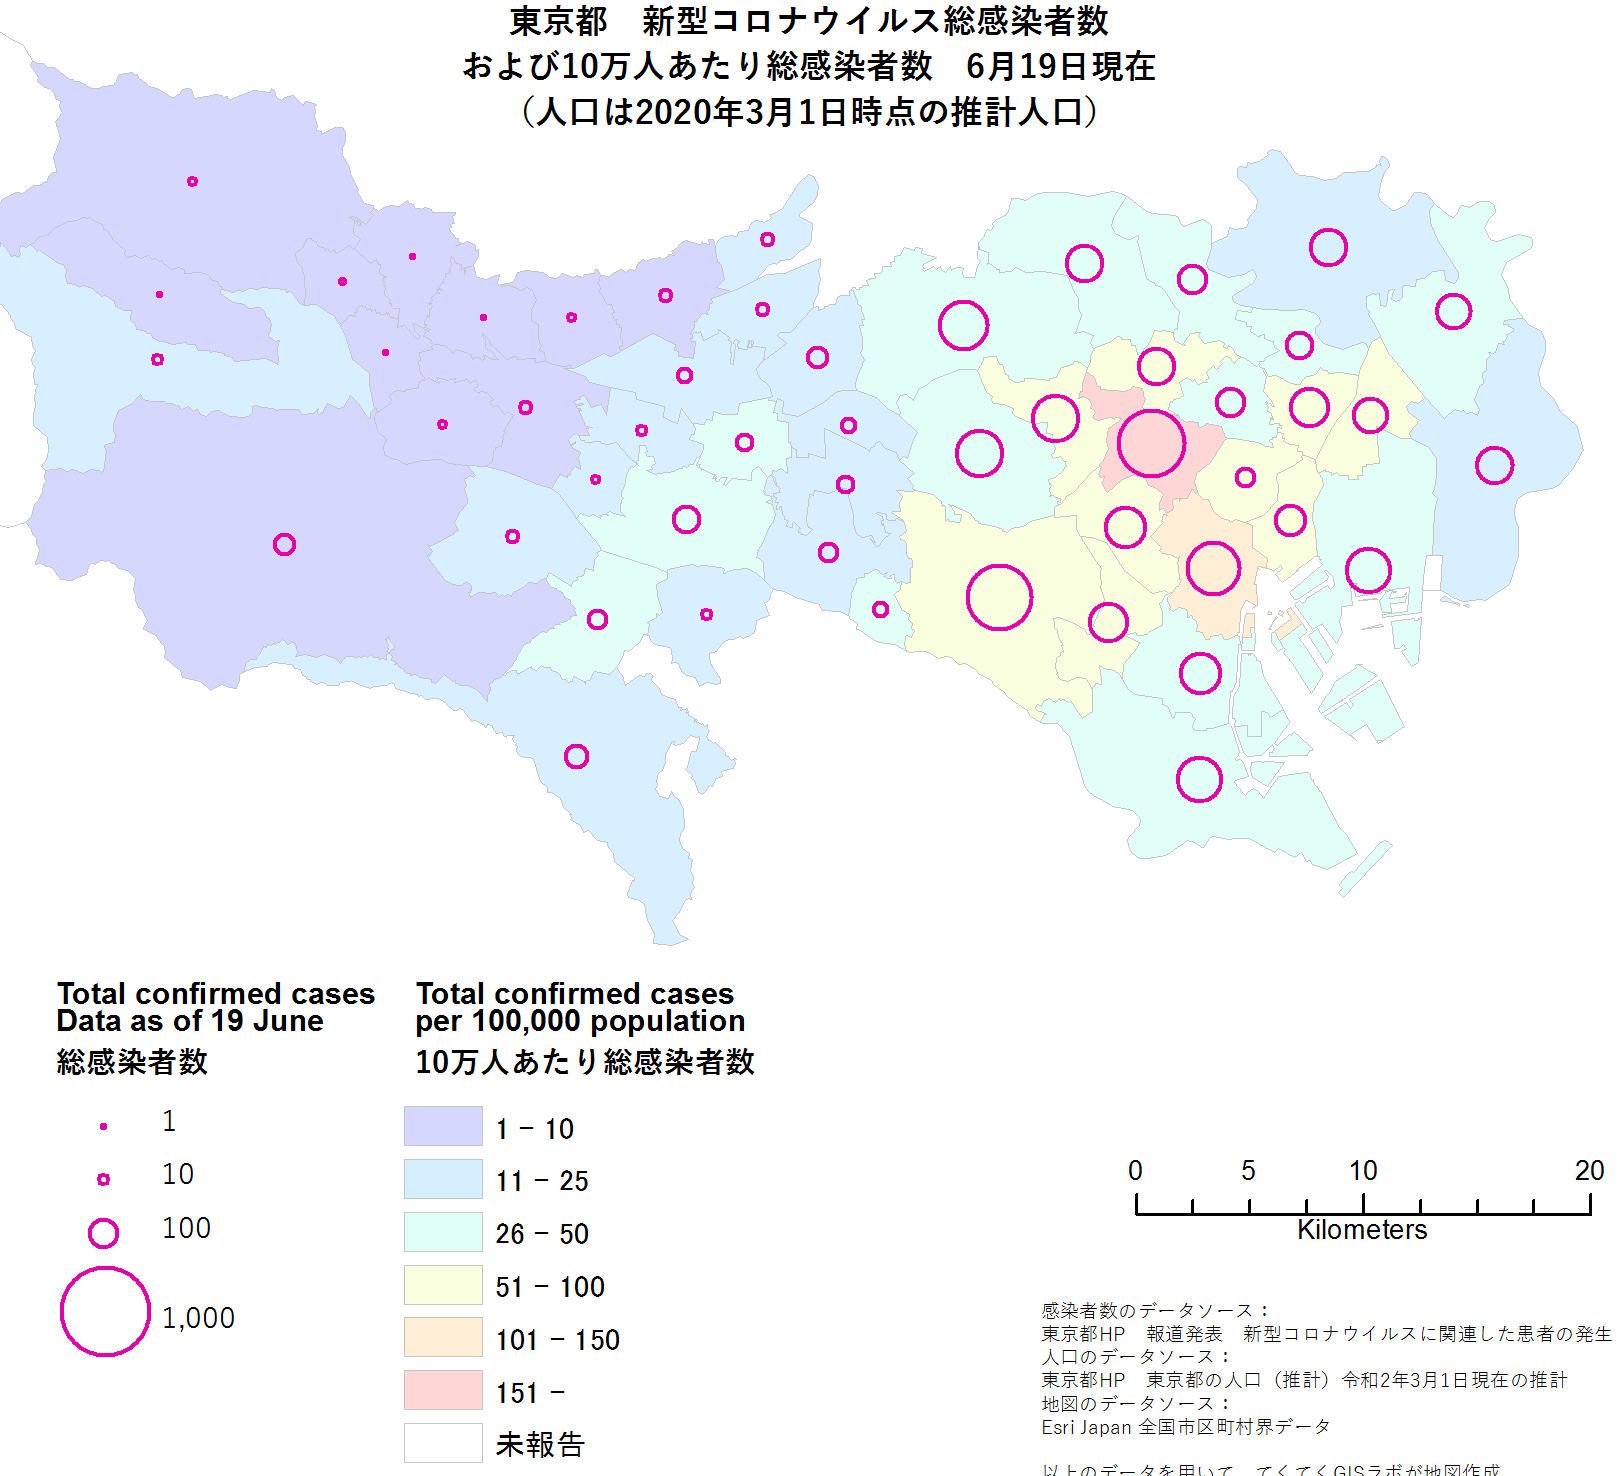 Total confirmed cases in Tokyo